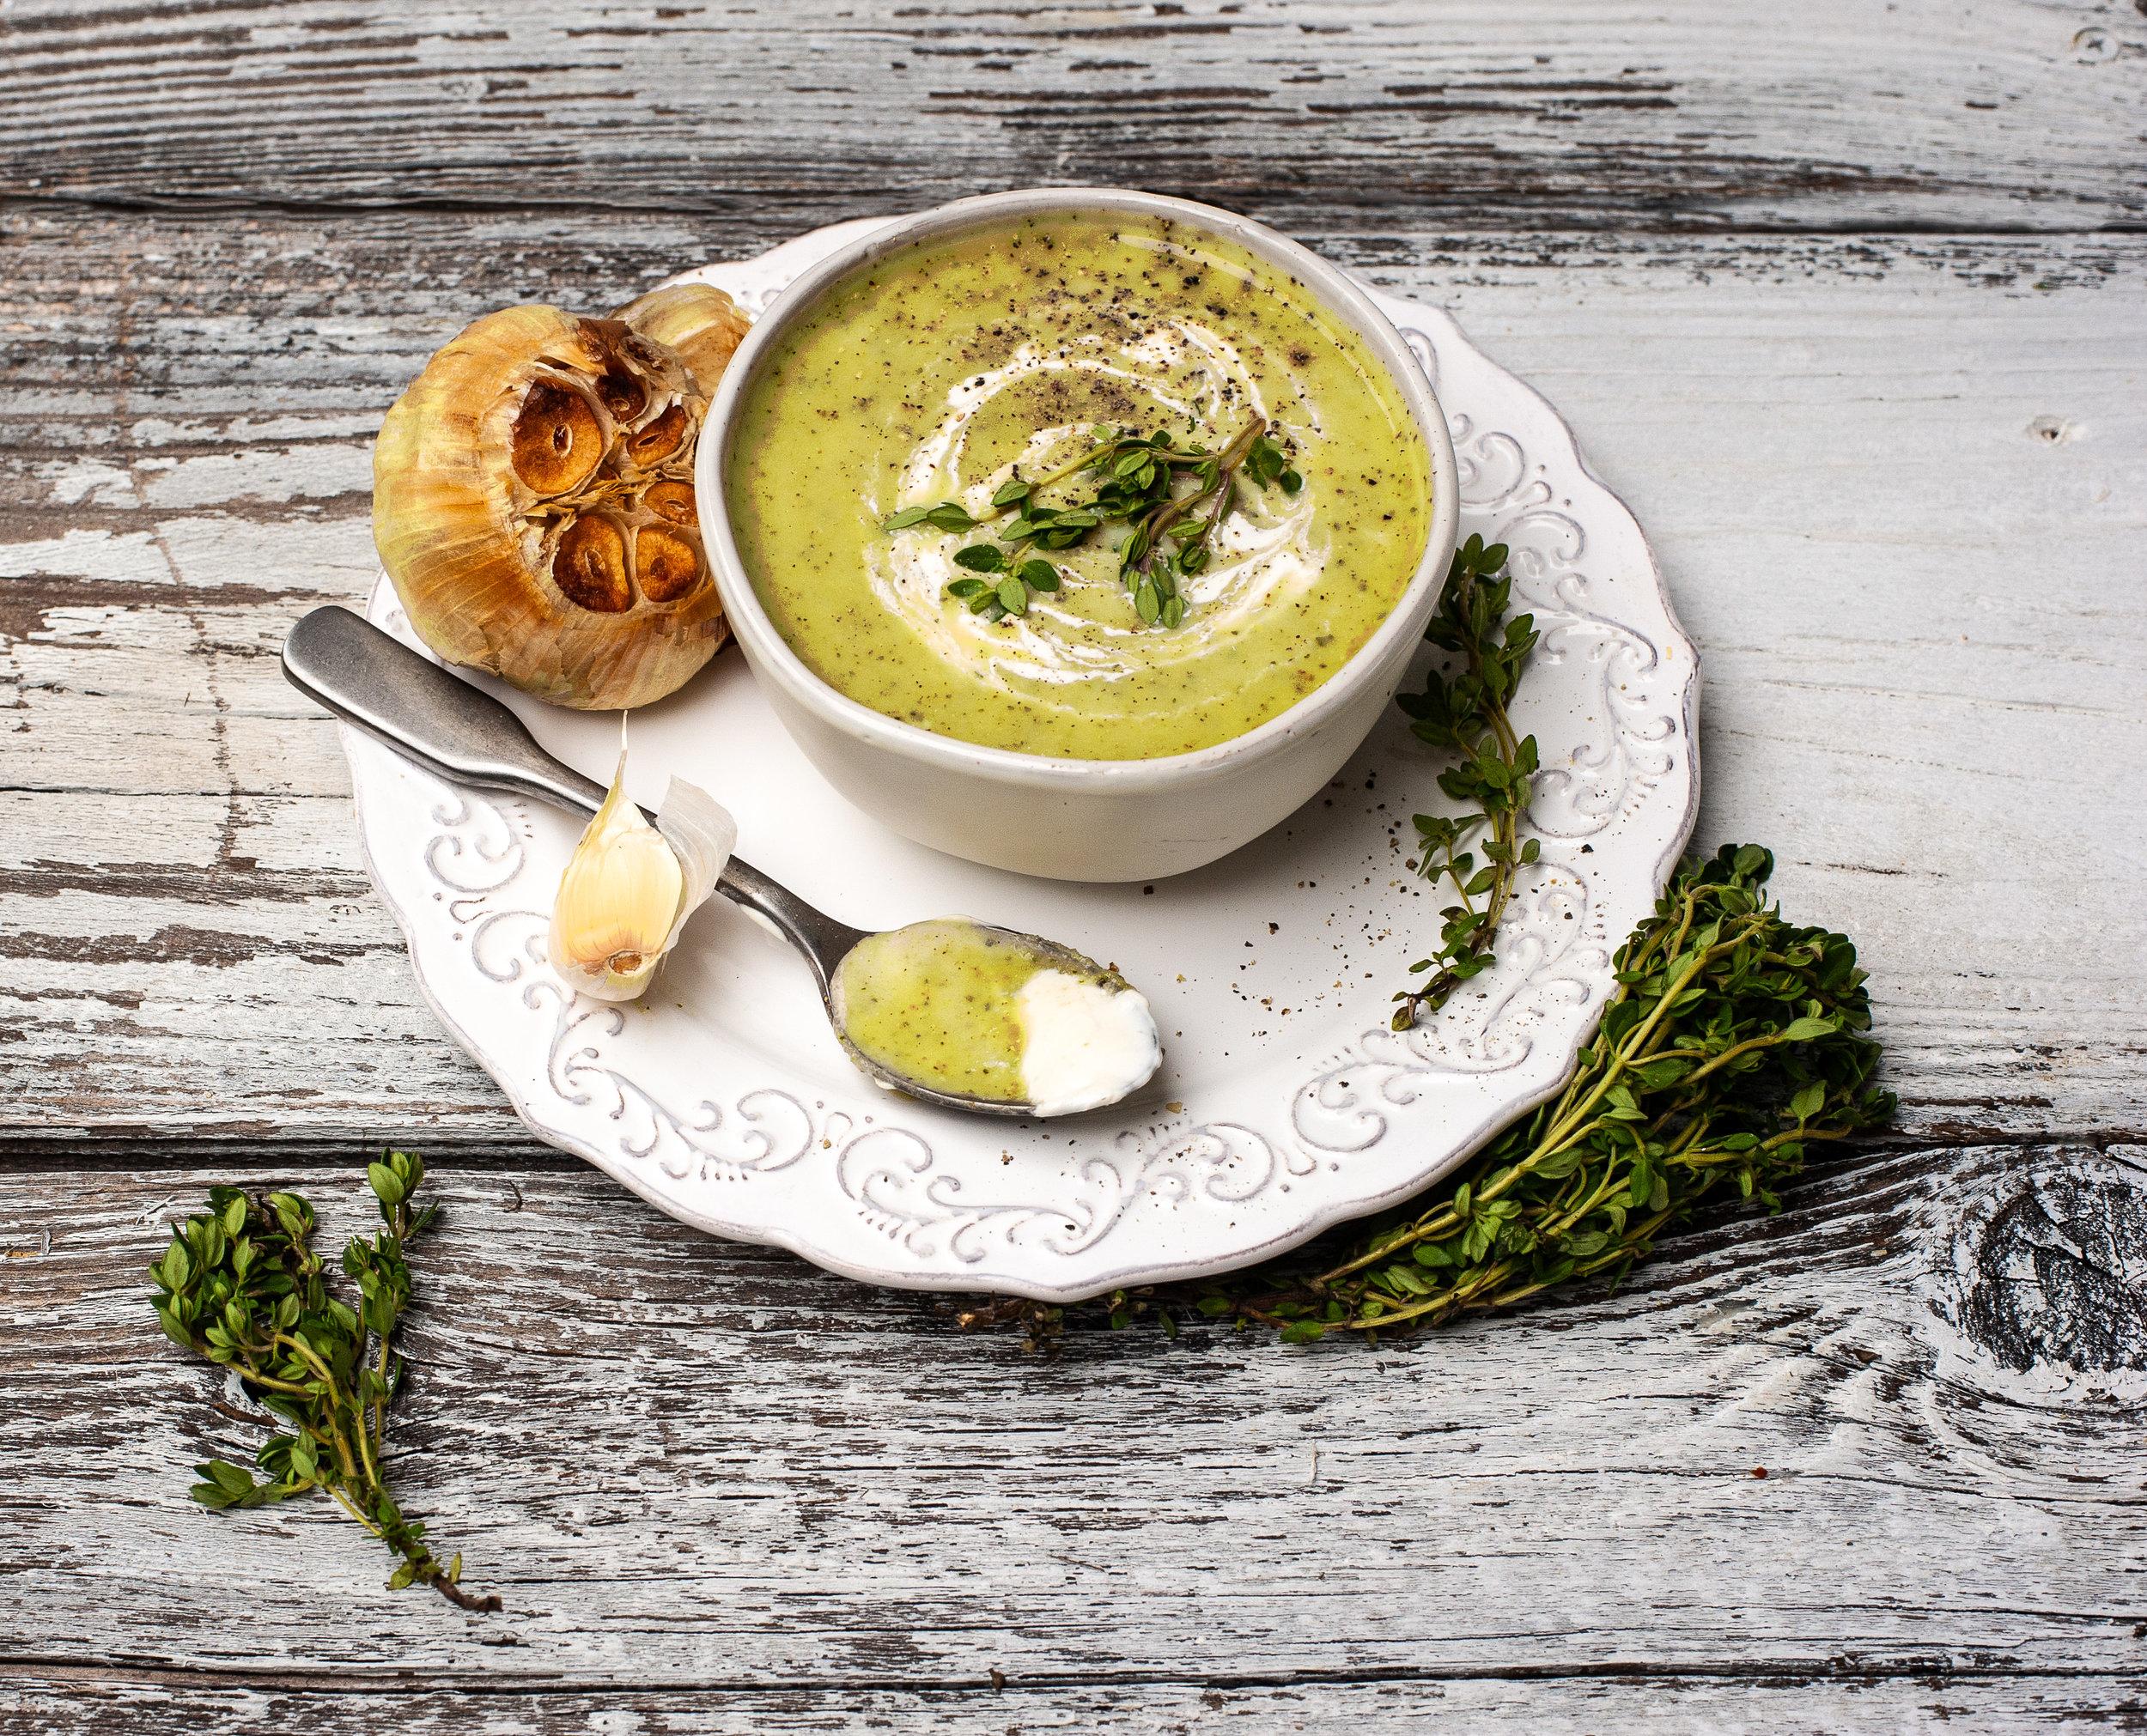 OATLY-Creamy-Zucchini-Soup-Bowl-Garlic-Oat-Cream-2.jpg